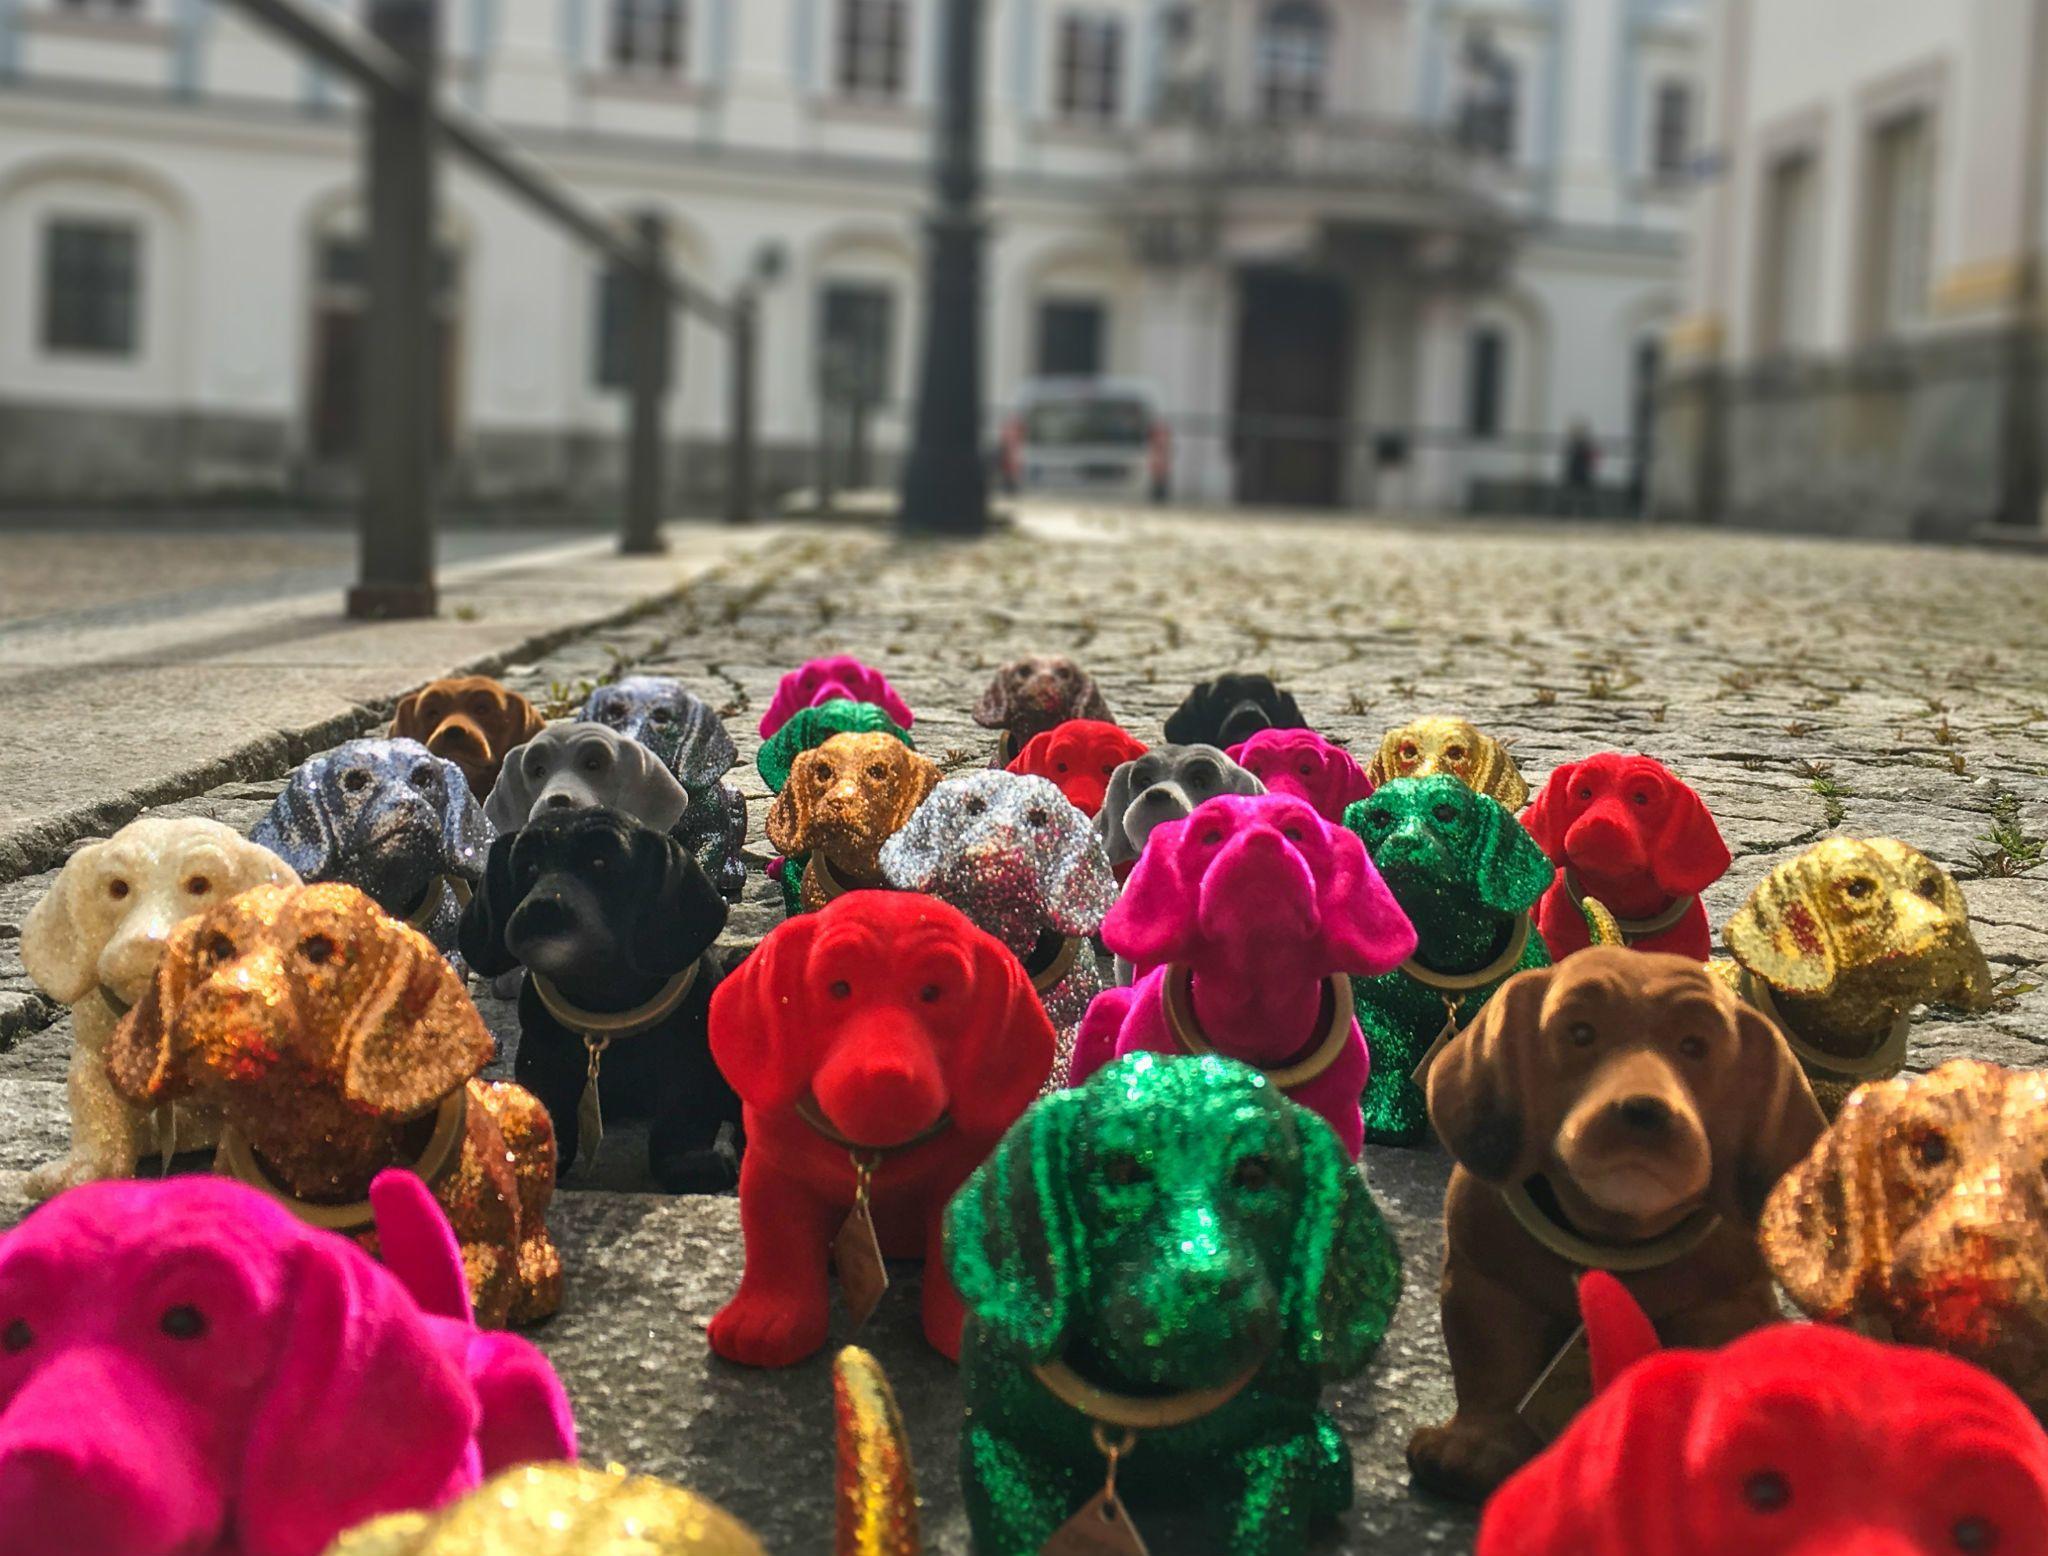 City envy we want a sausage dog museum like Passau